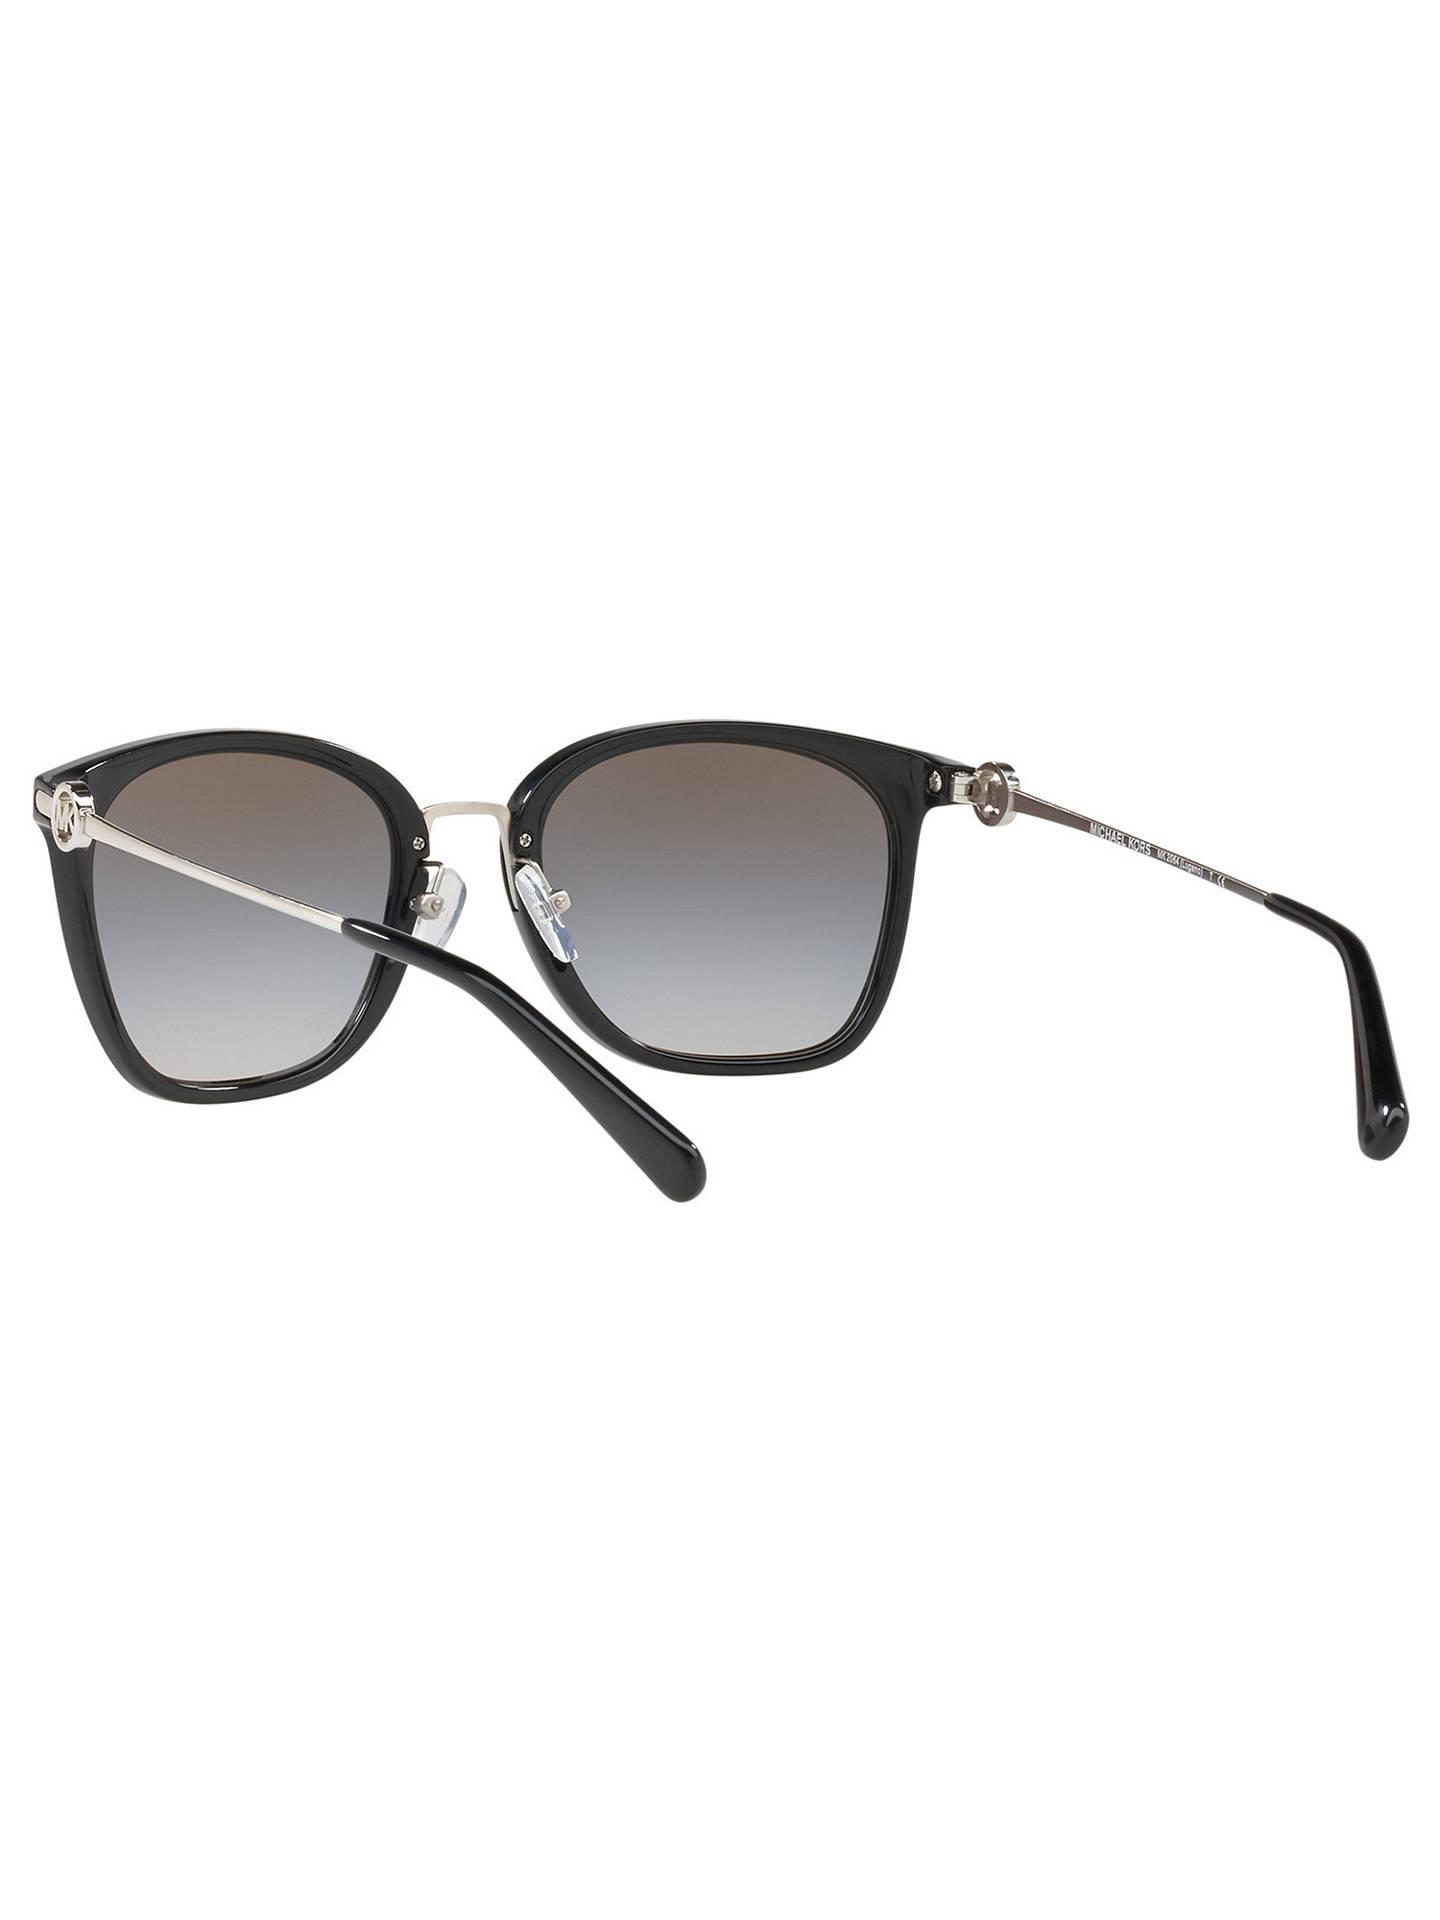 55c94c57ac BuyMichael Kors MK2064 Women s Lugano Square Sunglasses